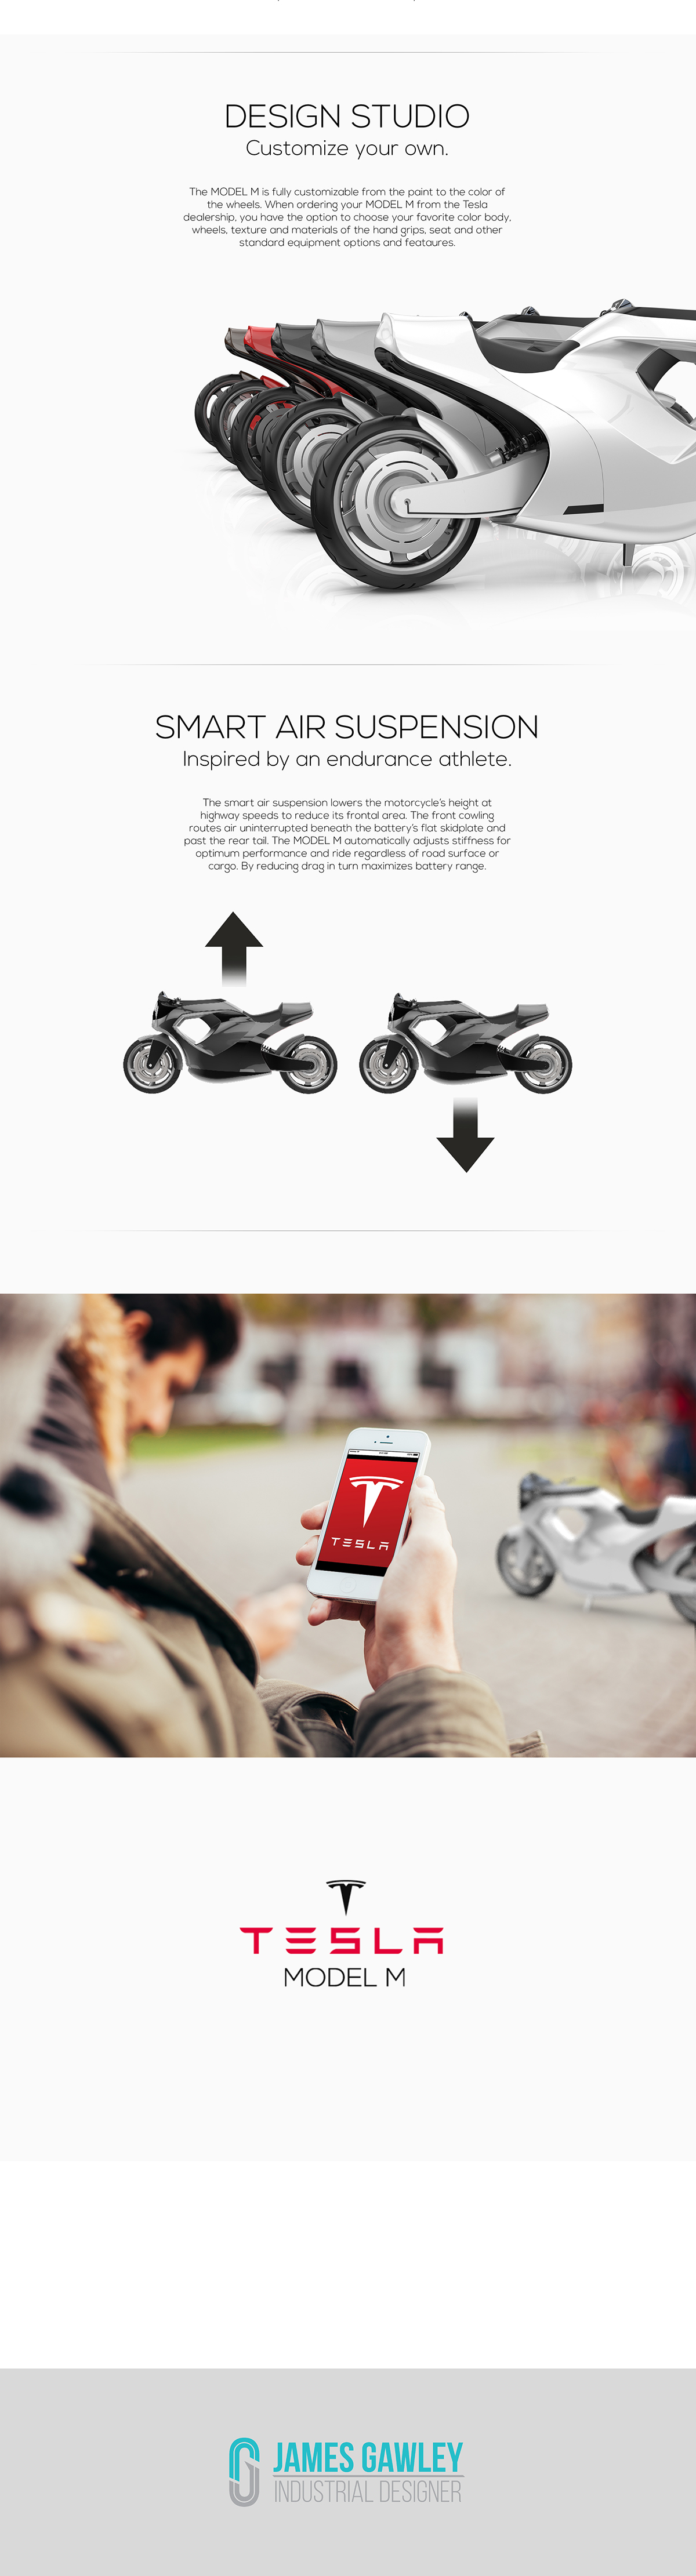 tesla model m motorcycle electric Sustainable transportation TRANS